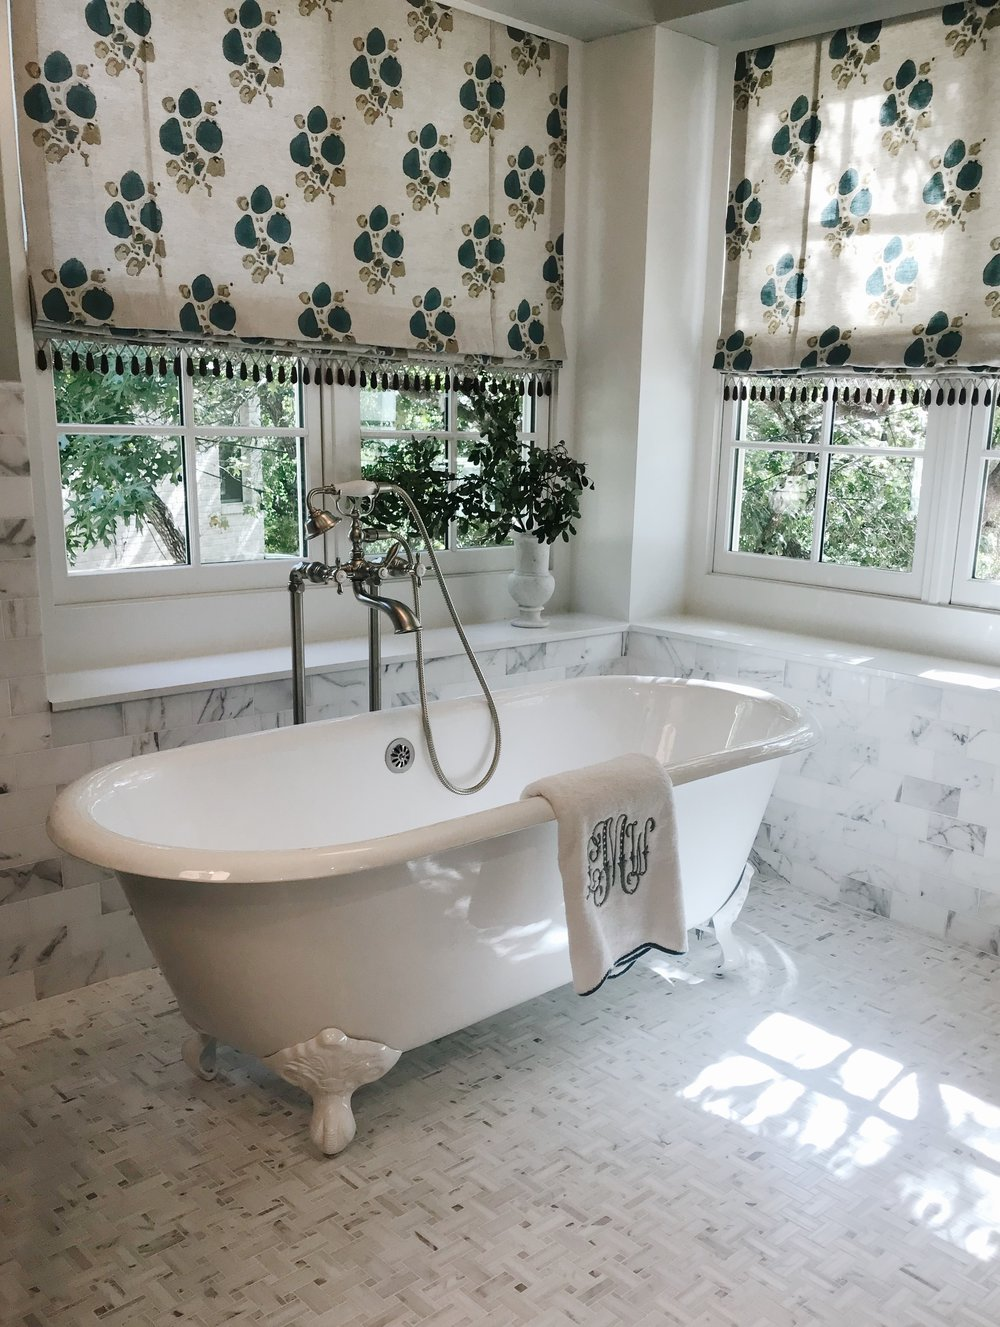 Avery Cox Design Blog: Southern Living 2018 Austin Idea House by Meredith Ellis, Master Bath